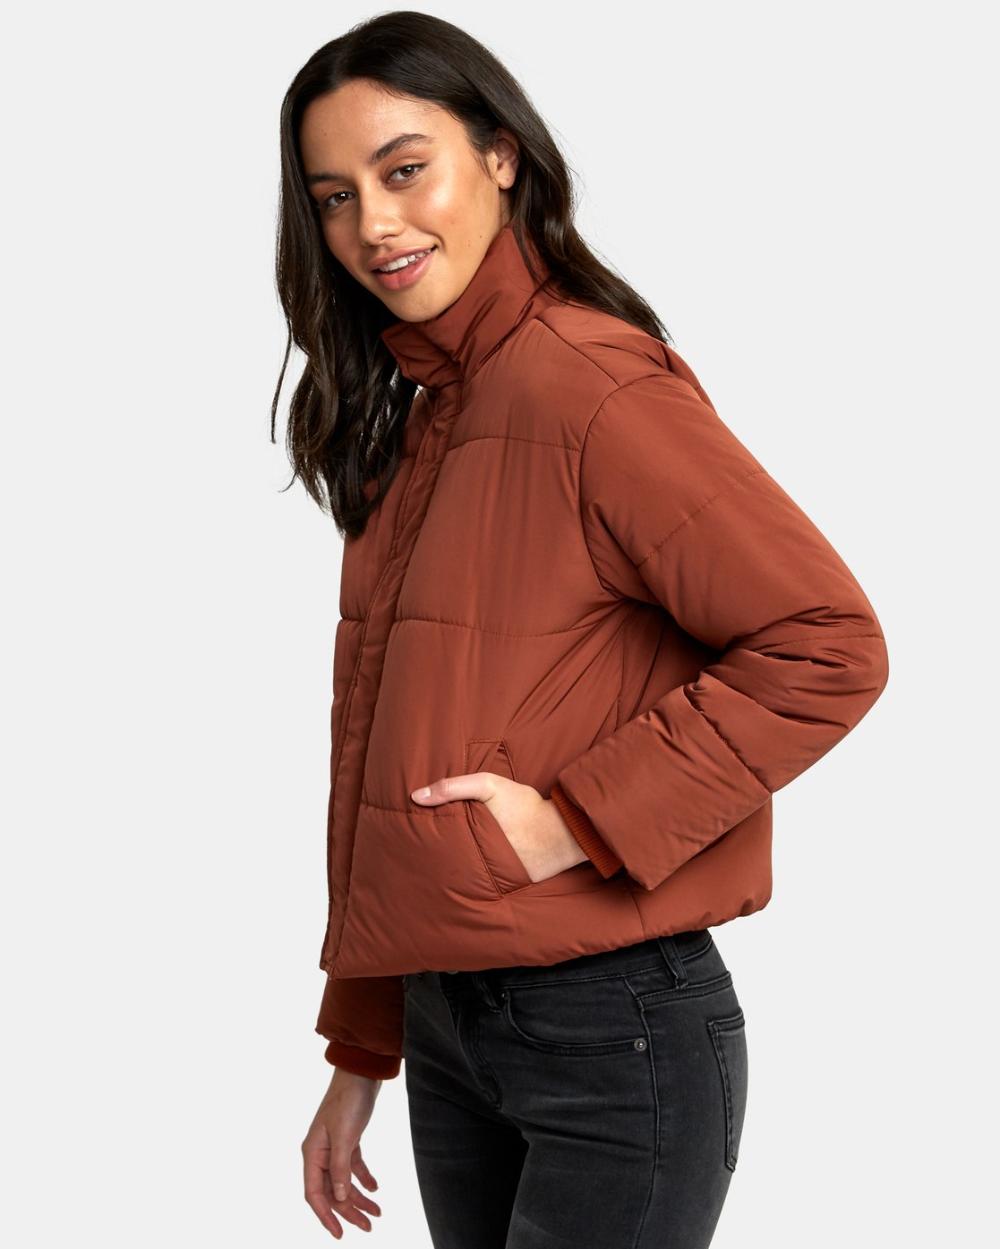 Eezeh Puffer Cropped Jacket W703qree Crop Jacket Puffer Jacket Style Jackets [ 1249 x 1000 Pixel ]